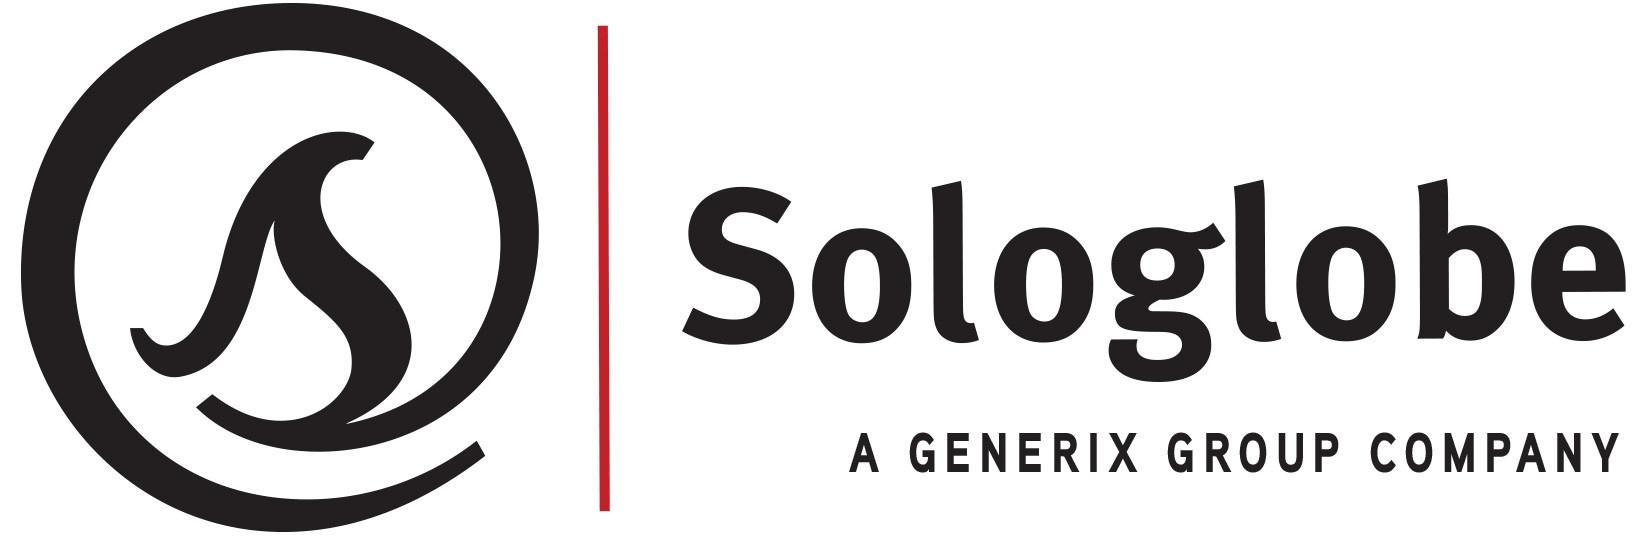 Sologlobe logo.jpg